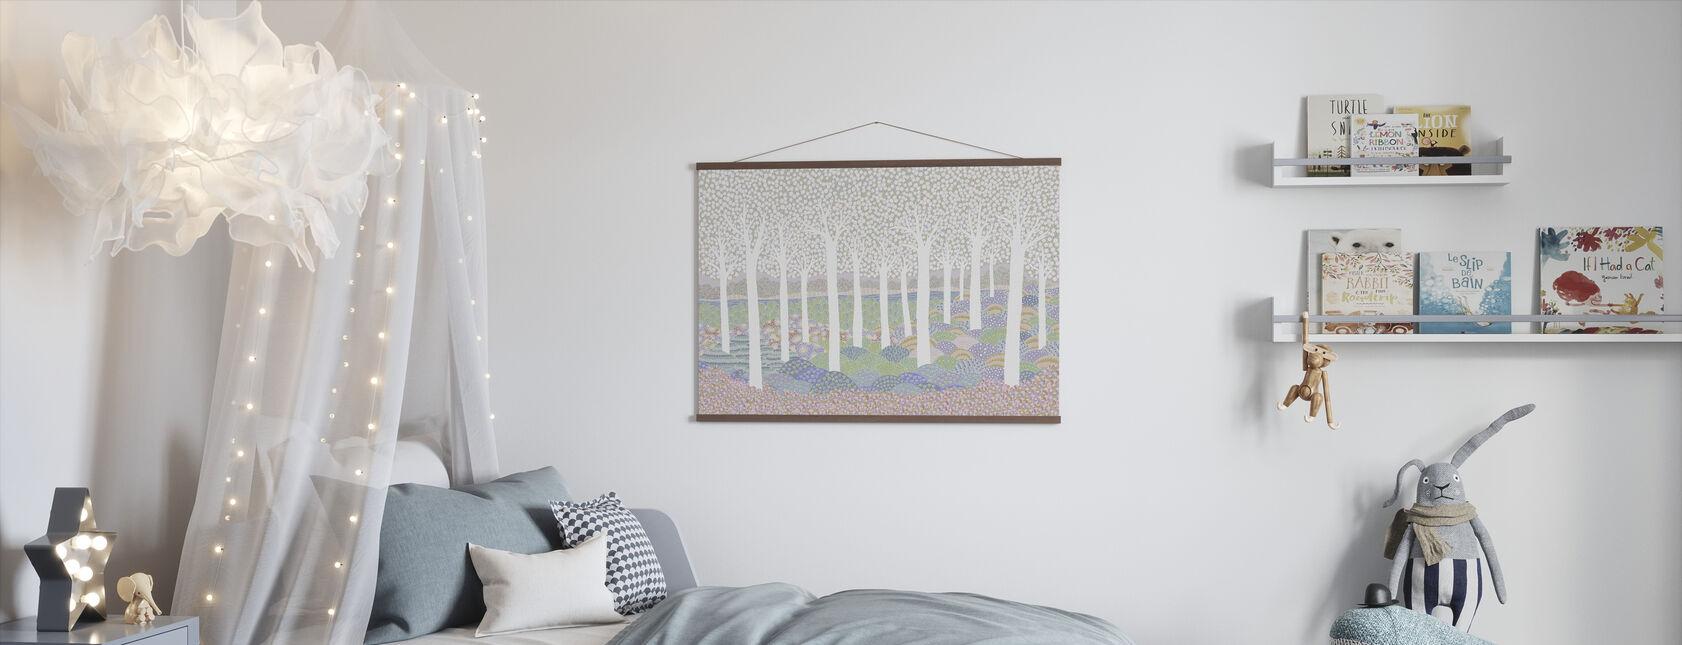 Flower Forest - Poster - Kids Room